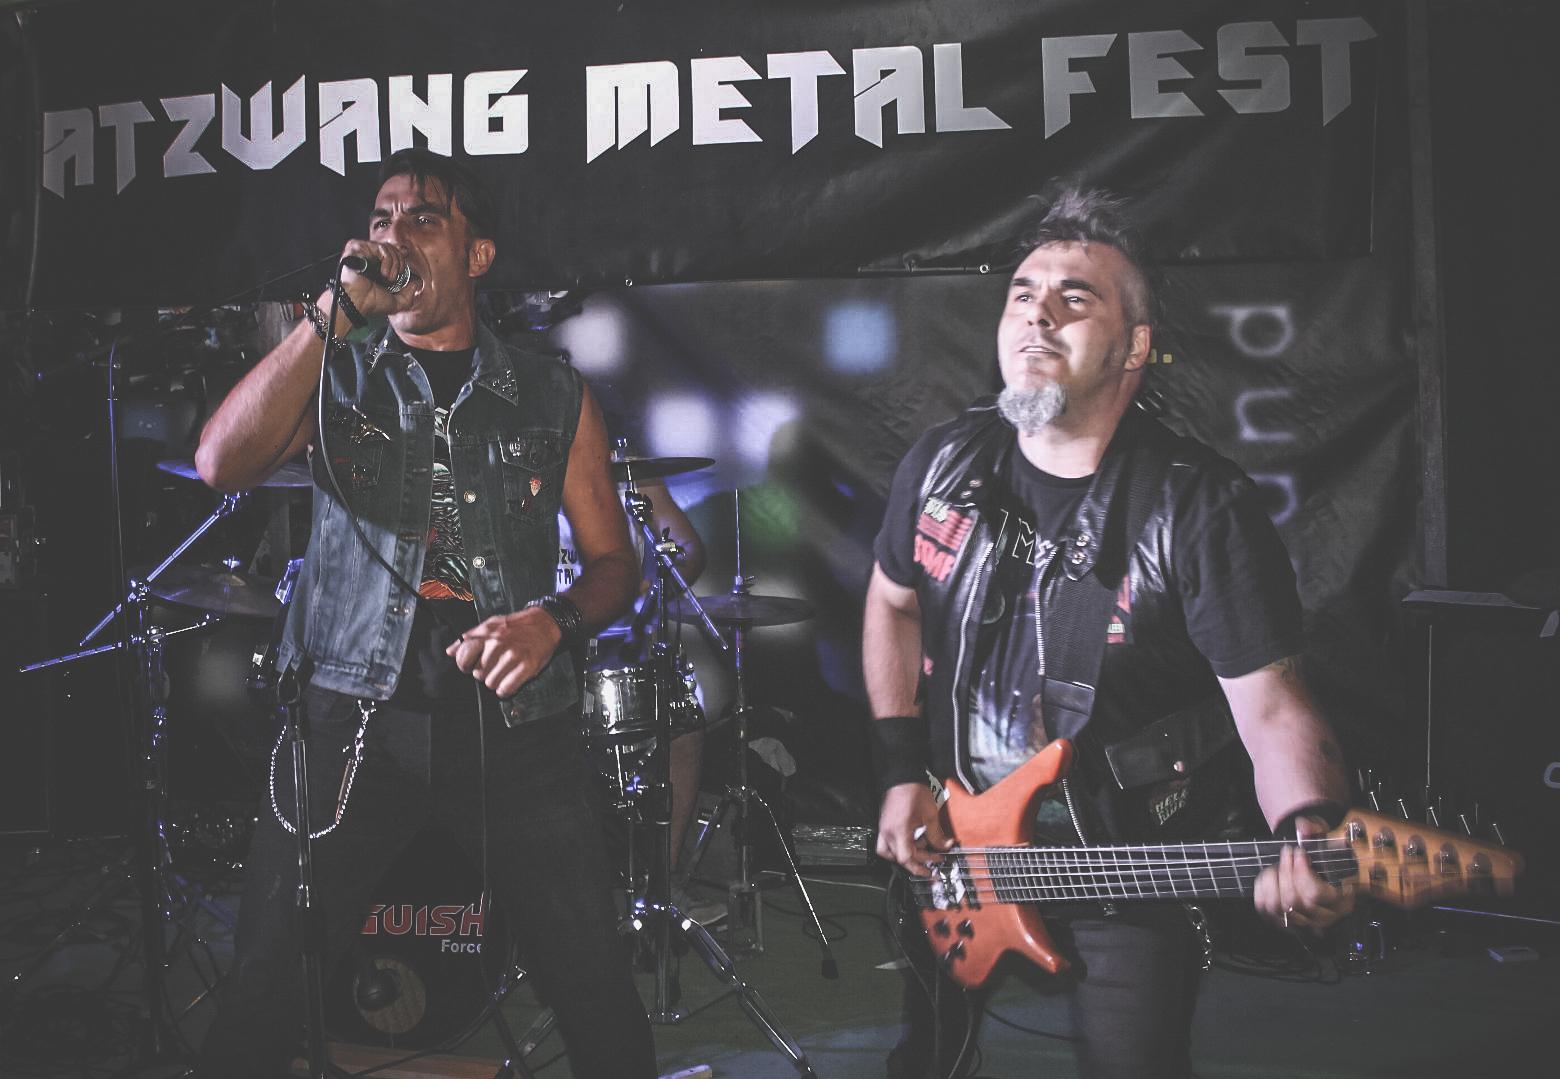 Atzwang Metal Fest 9 21